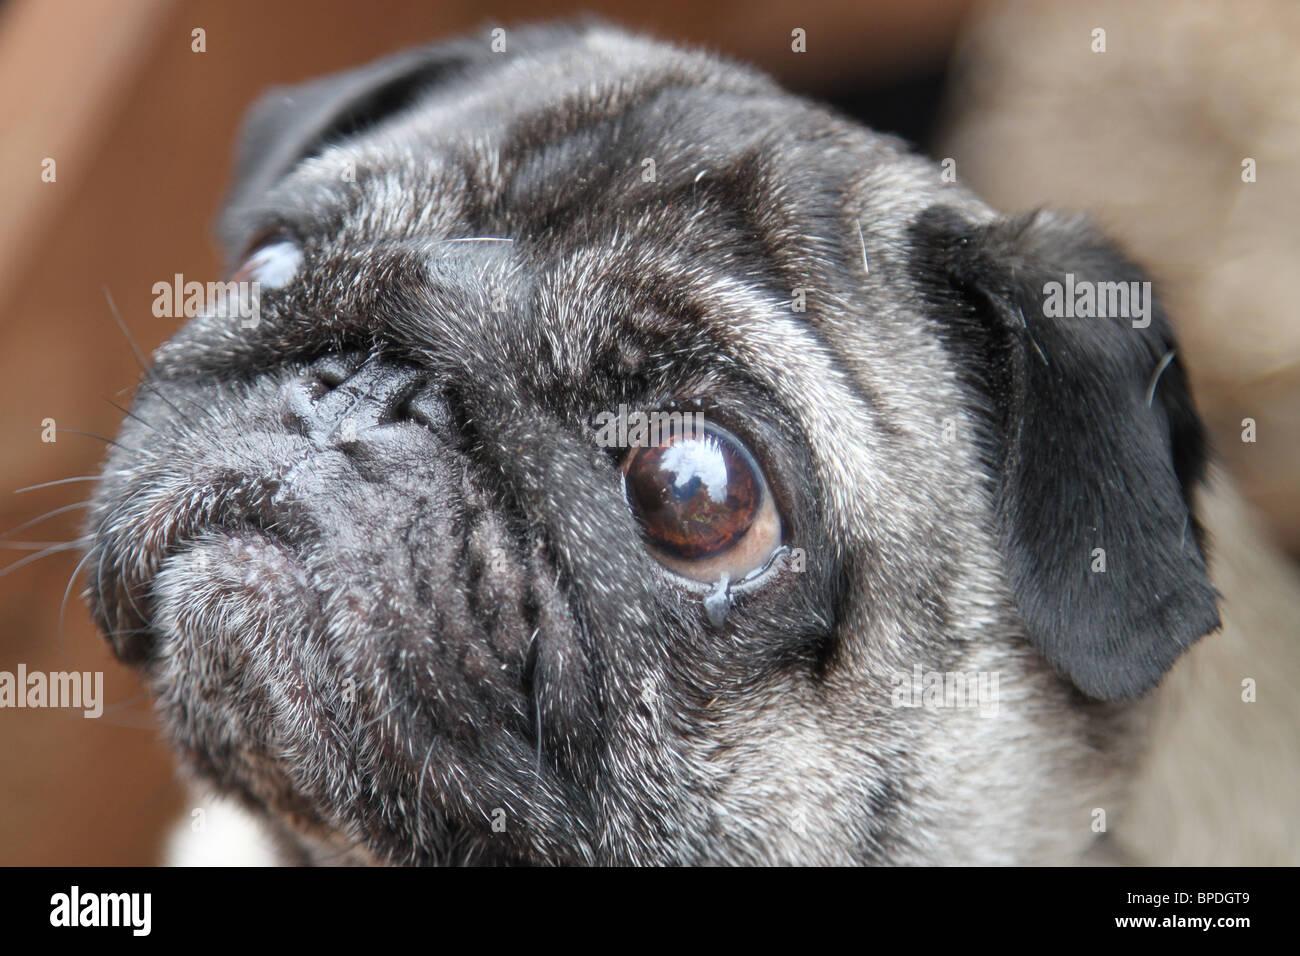 Close up of a Pug head. - Stock Image